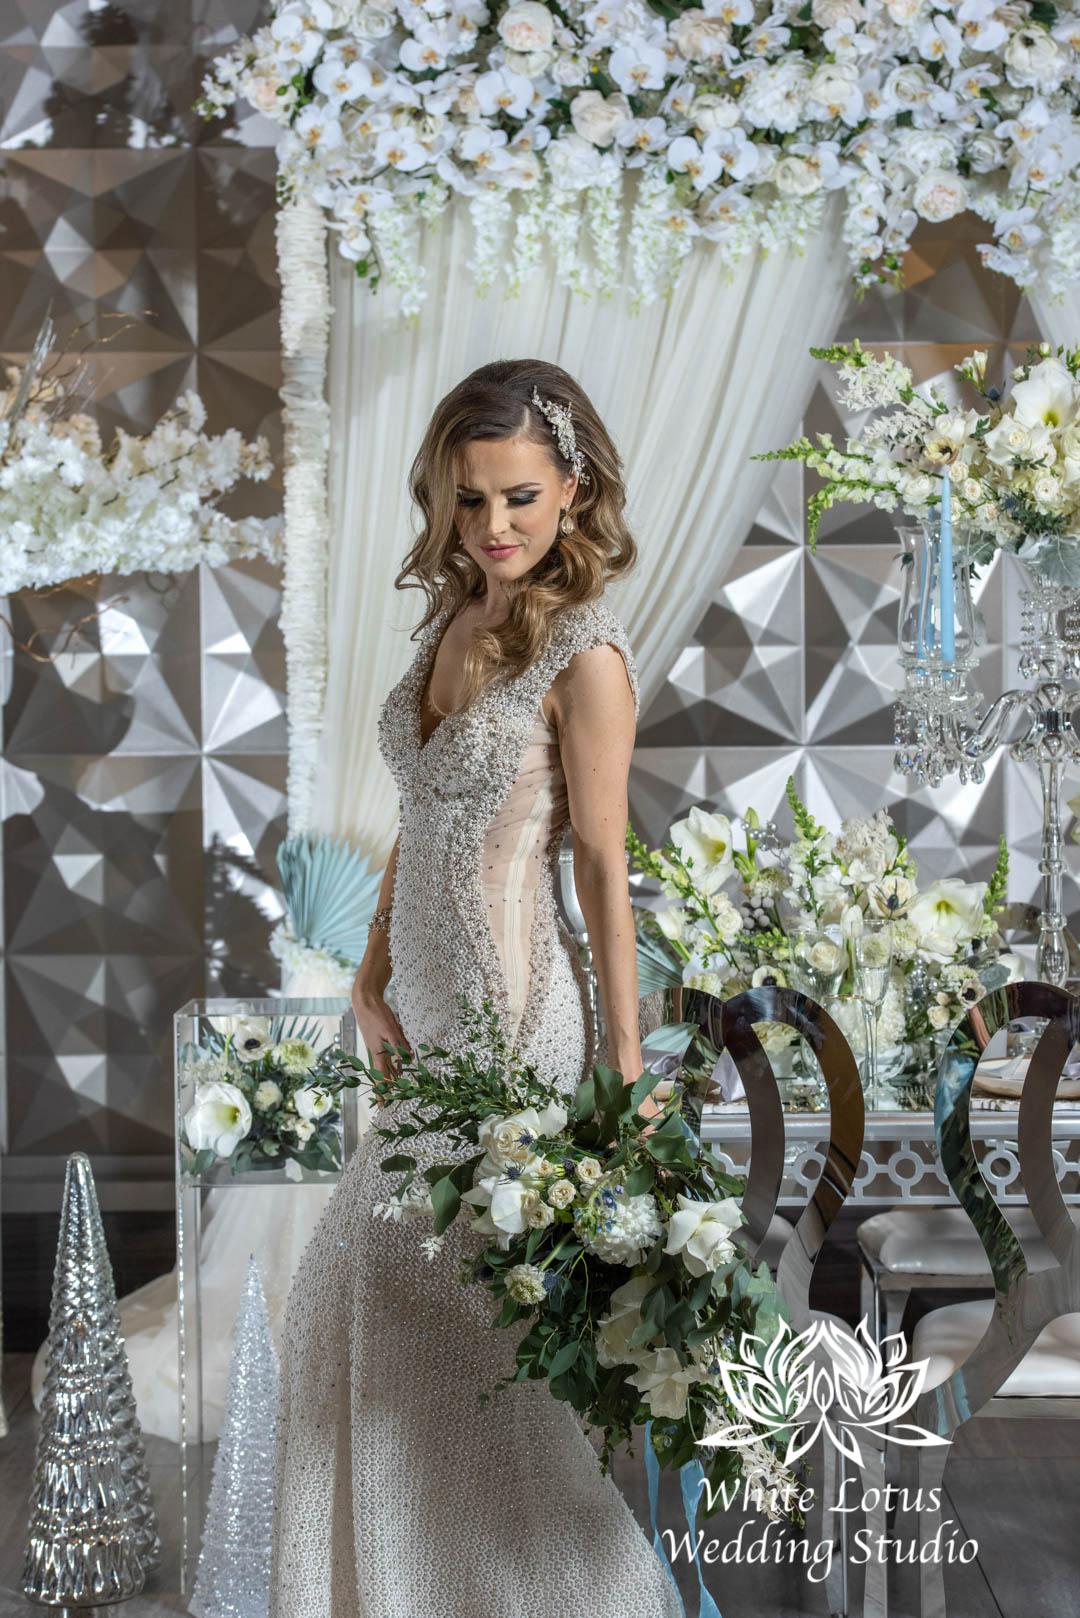 155- GLAM WINTERLUXE WEDDING INSPIRATION